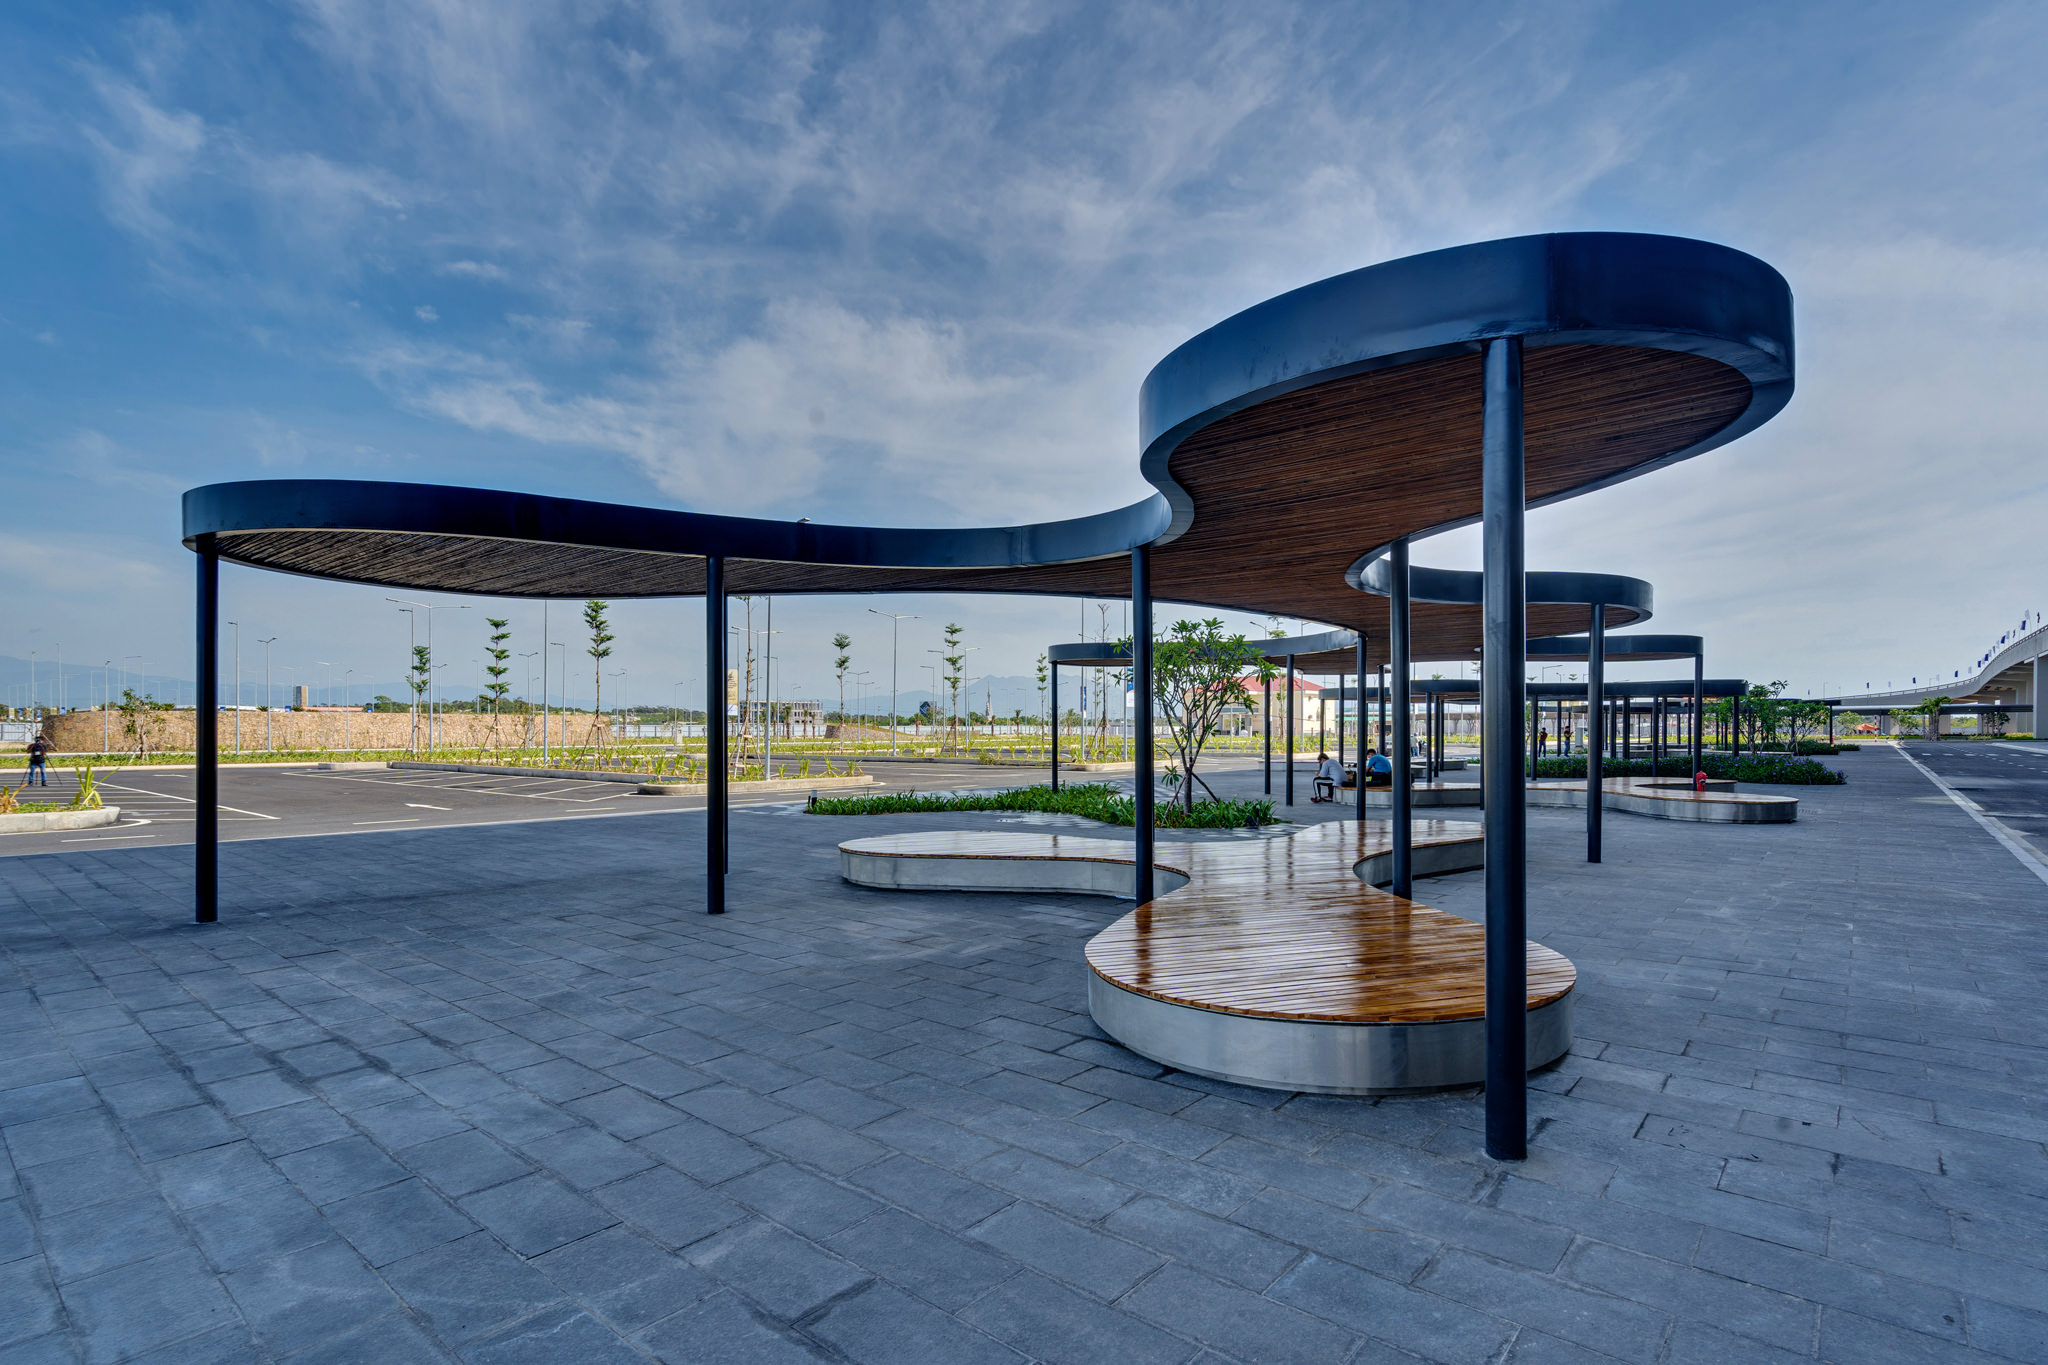 20180626 - Cam Ranh Airport - Architecture - 0262.jpg